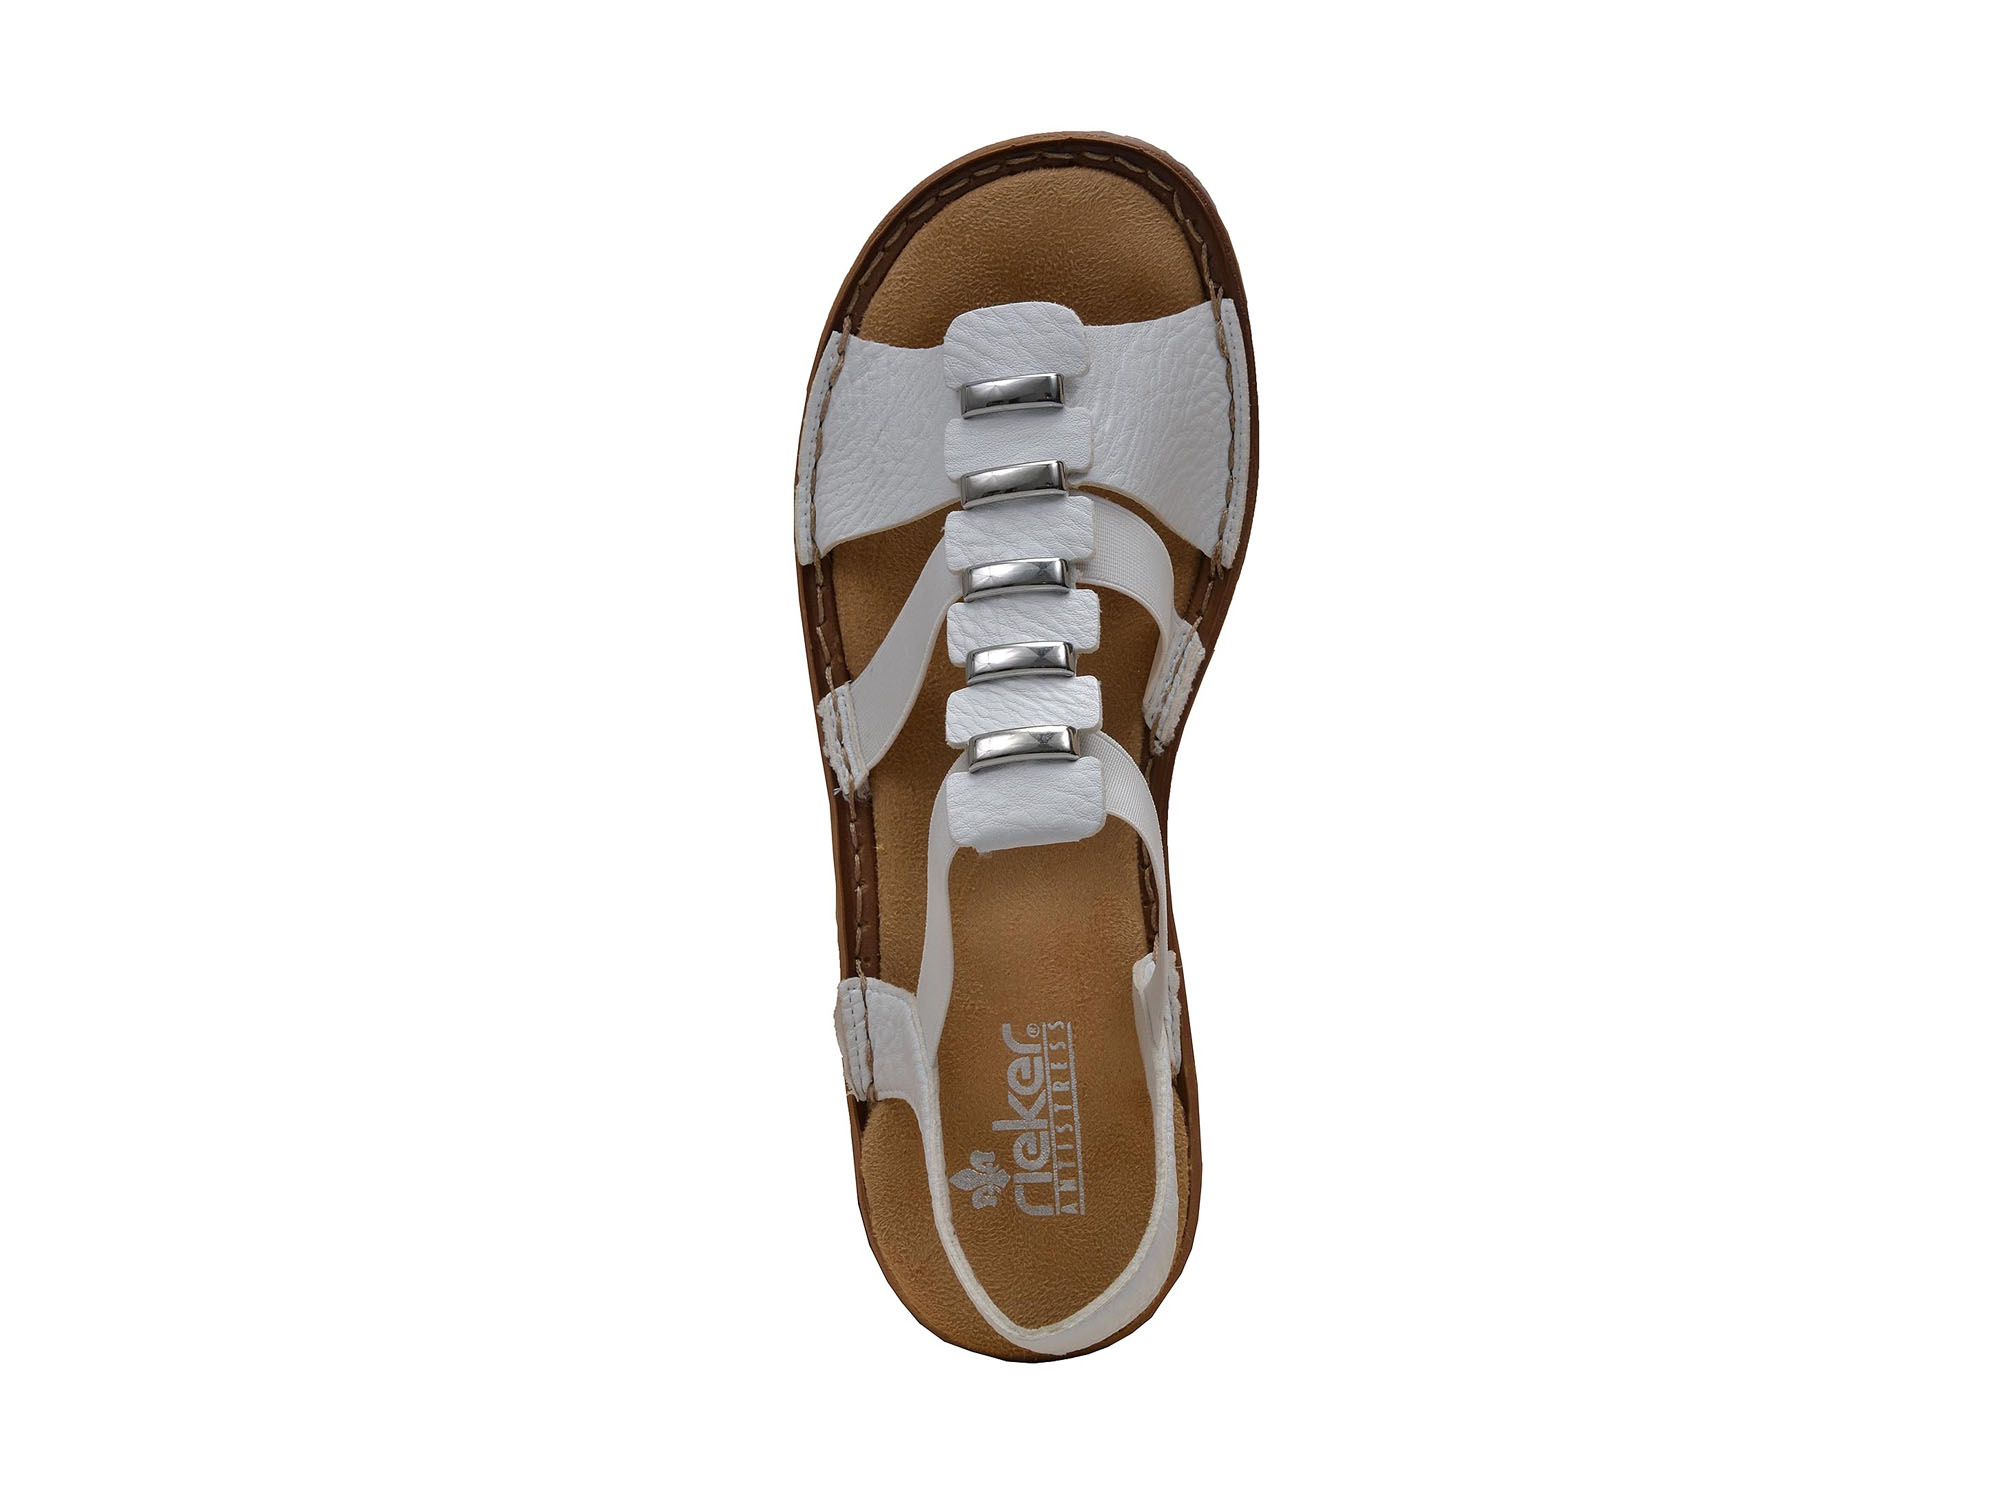 detail Dámská obuv RIEKER br 62850 80 WEISS ... 635bf82f89